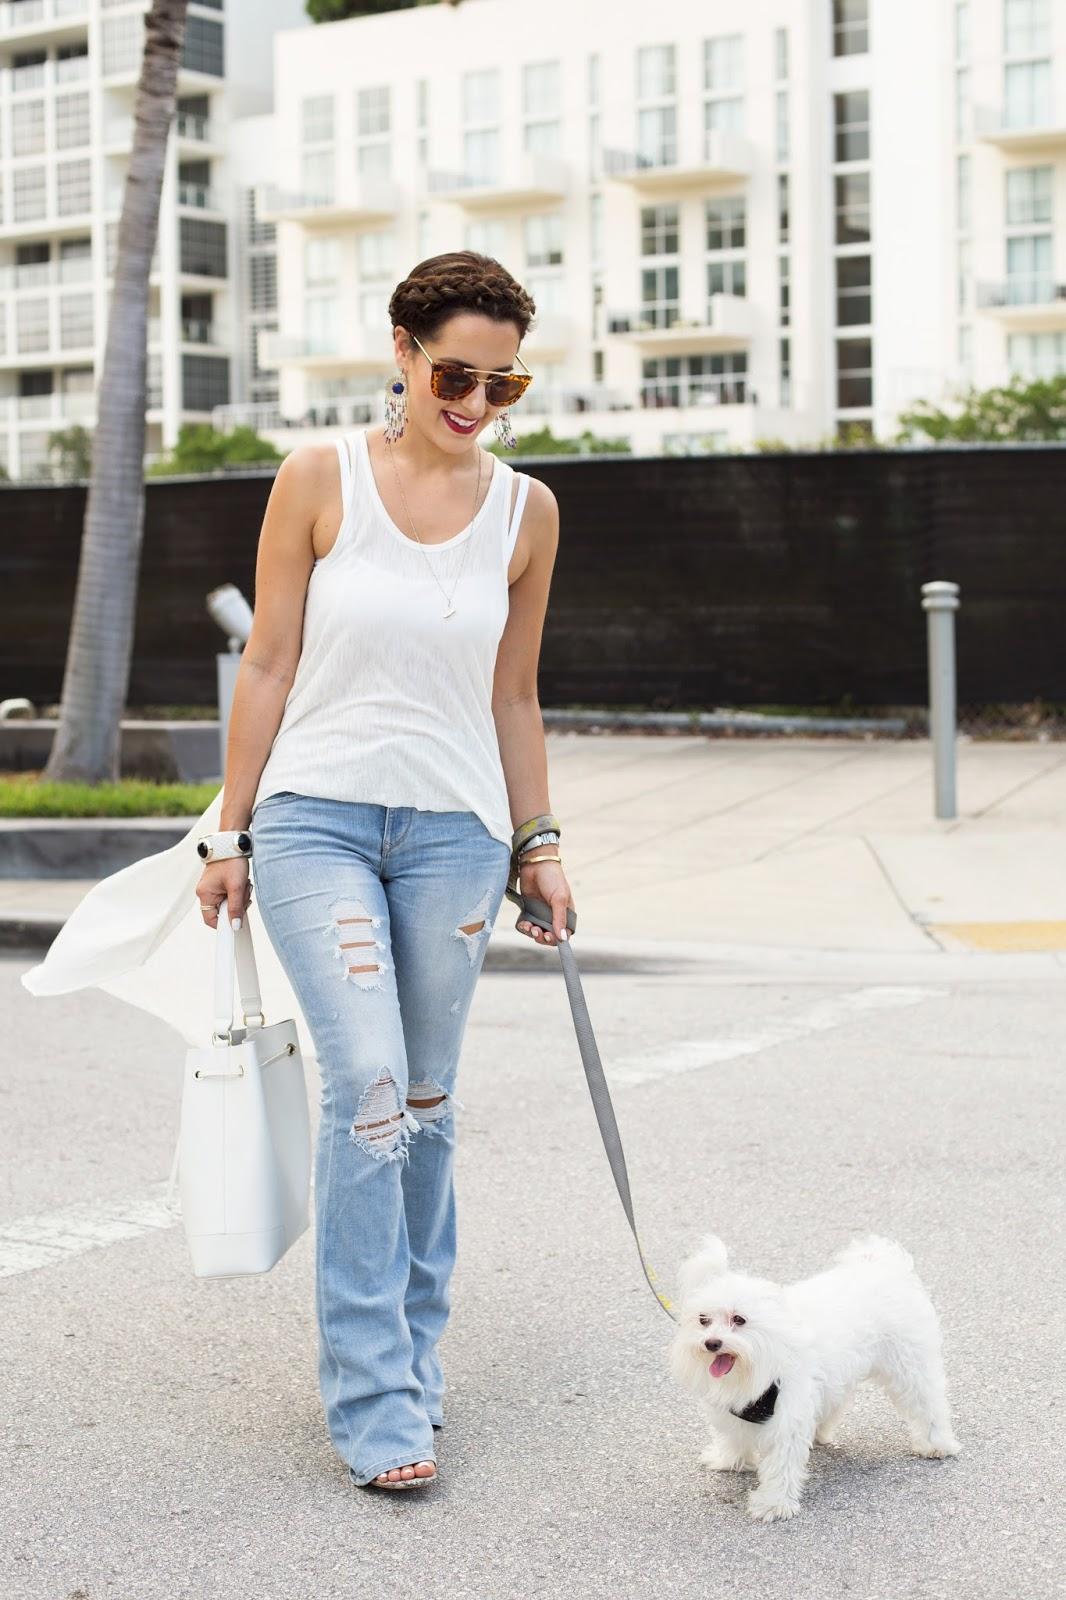 Fashion blogger kelly saks pet maltese dog